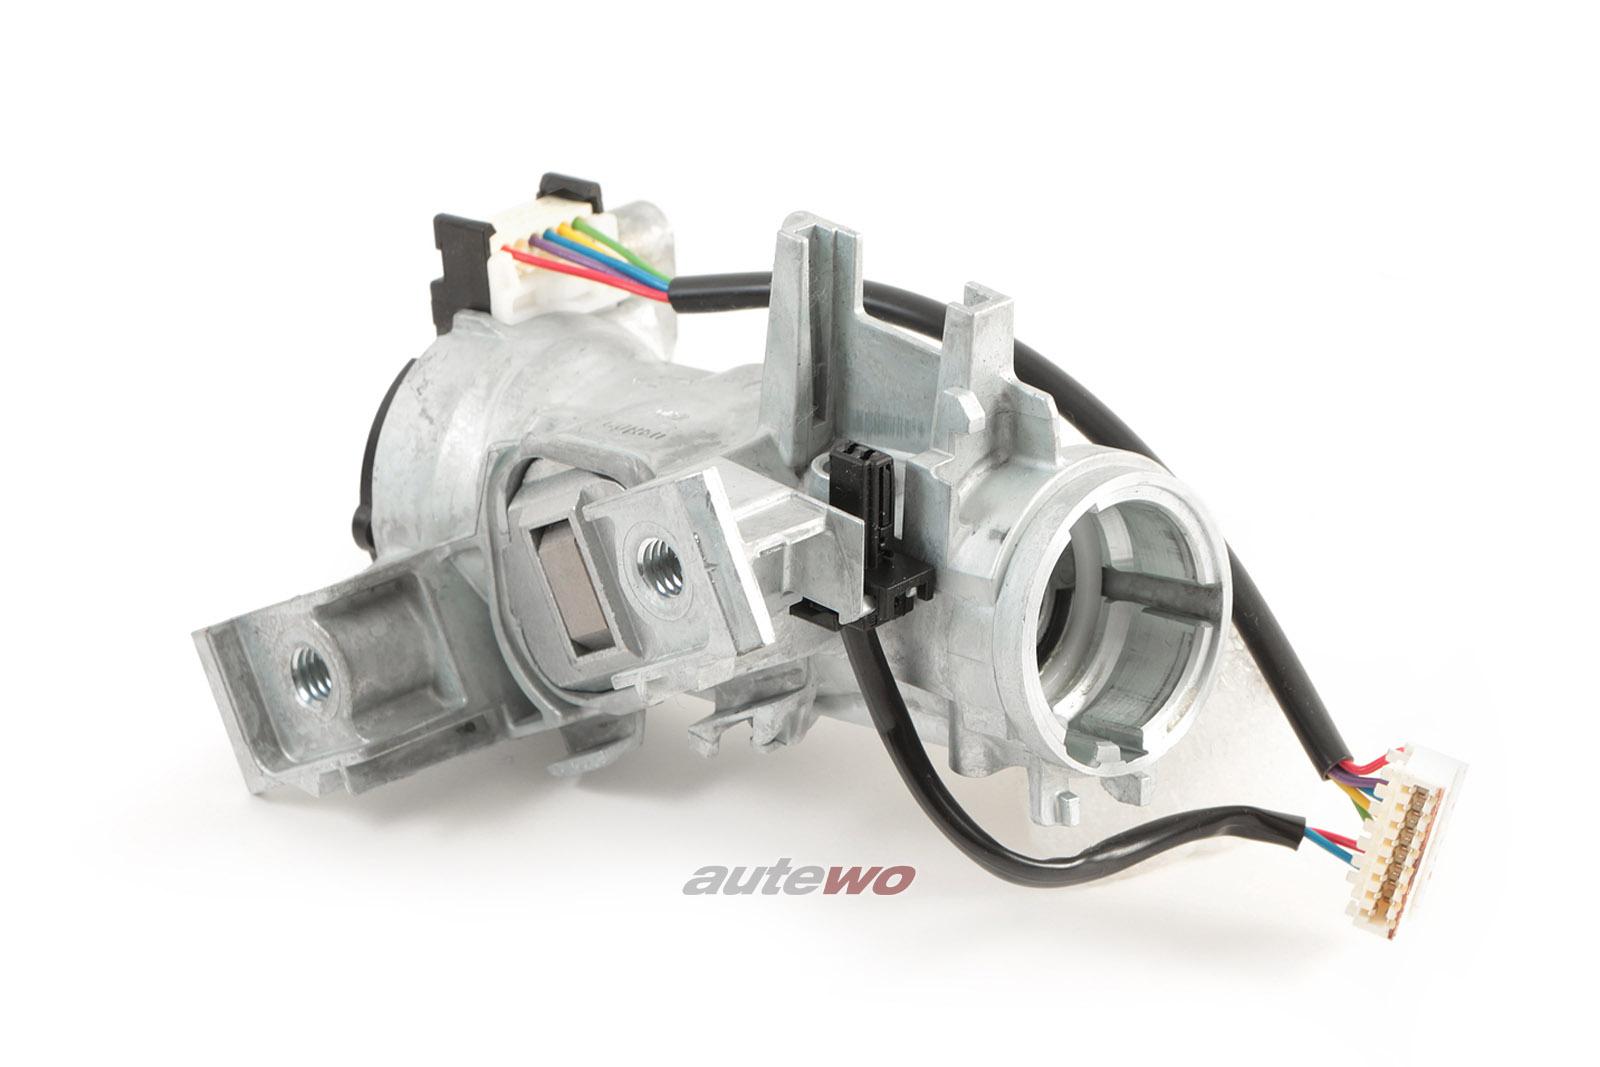 1K0905851B NEU Audi/VW/SEAT/Skoda A1/A3/S3 8V/Q3/Golf Lenkschloss/Zündschlos